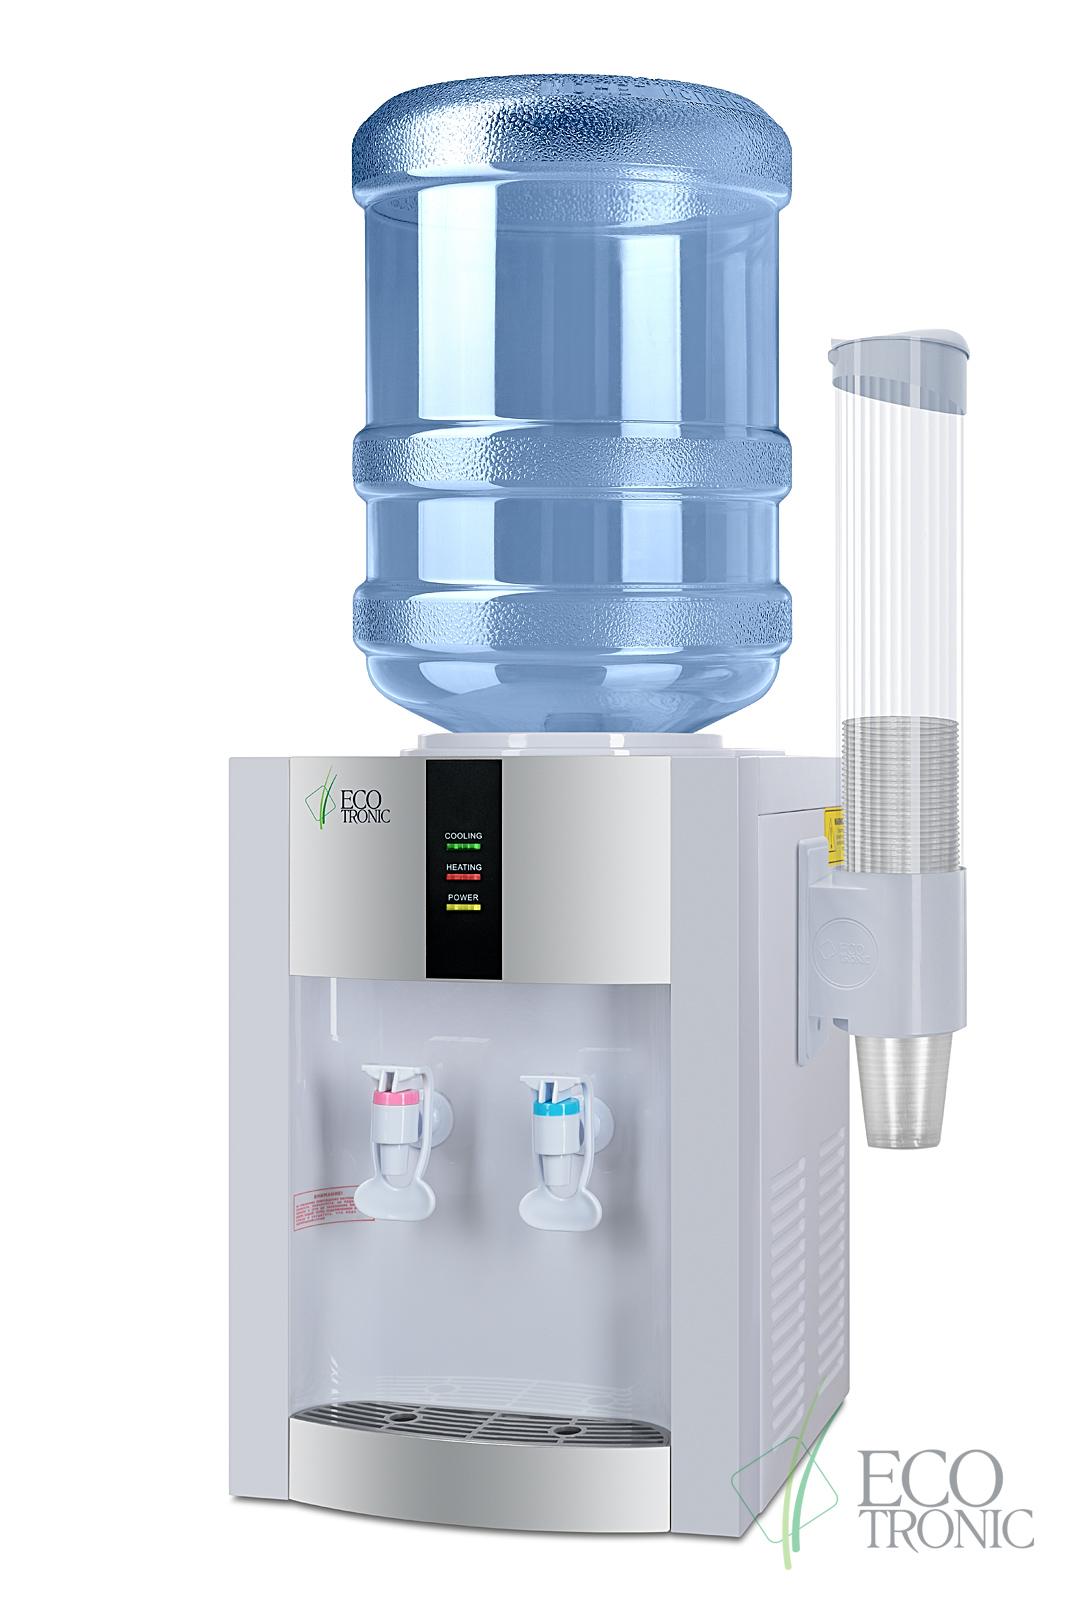 Кулер Ecotronic H1-T White с компрессорным охлаждением